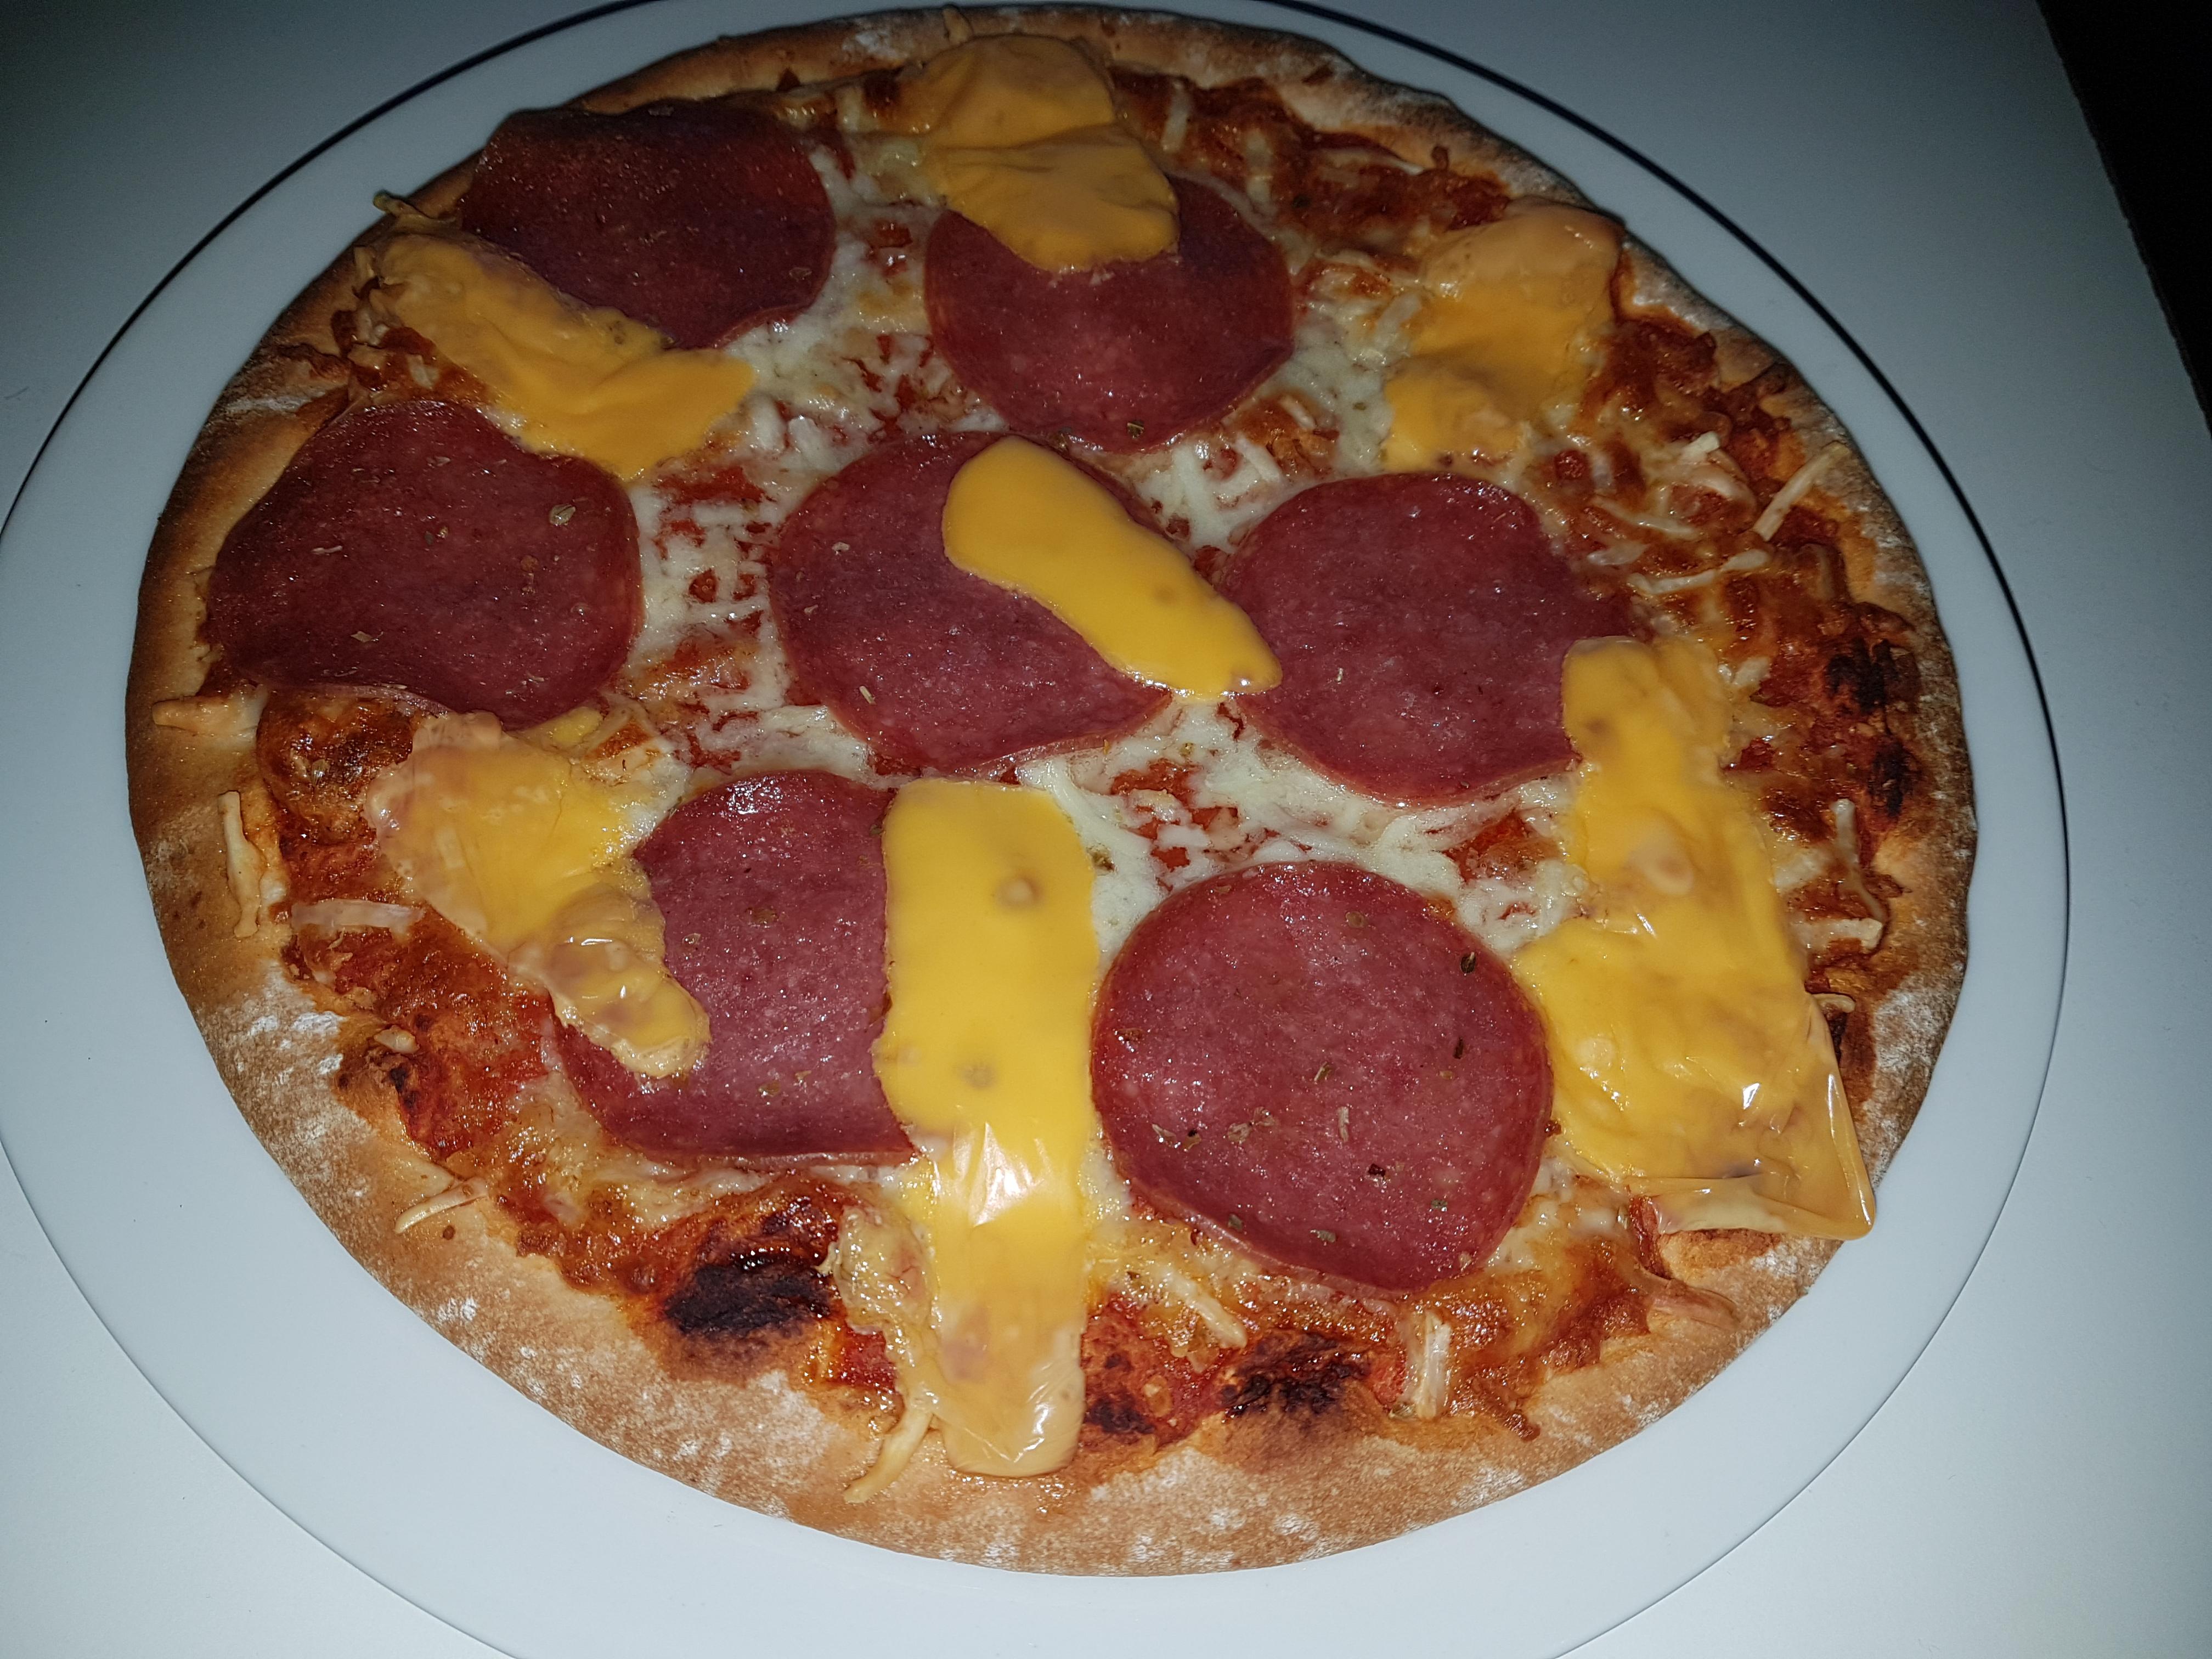 http://foodloader.net/Holz_2018-05-30_Pizza.jpg